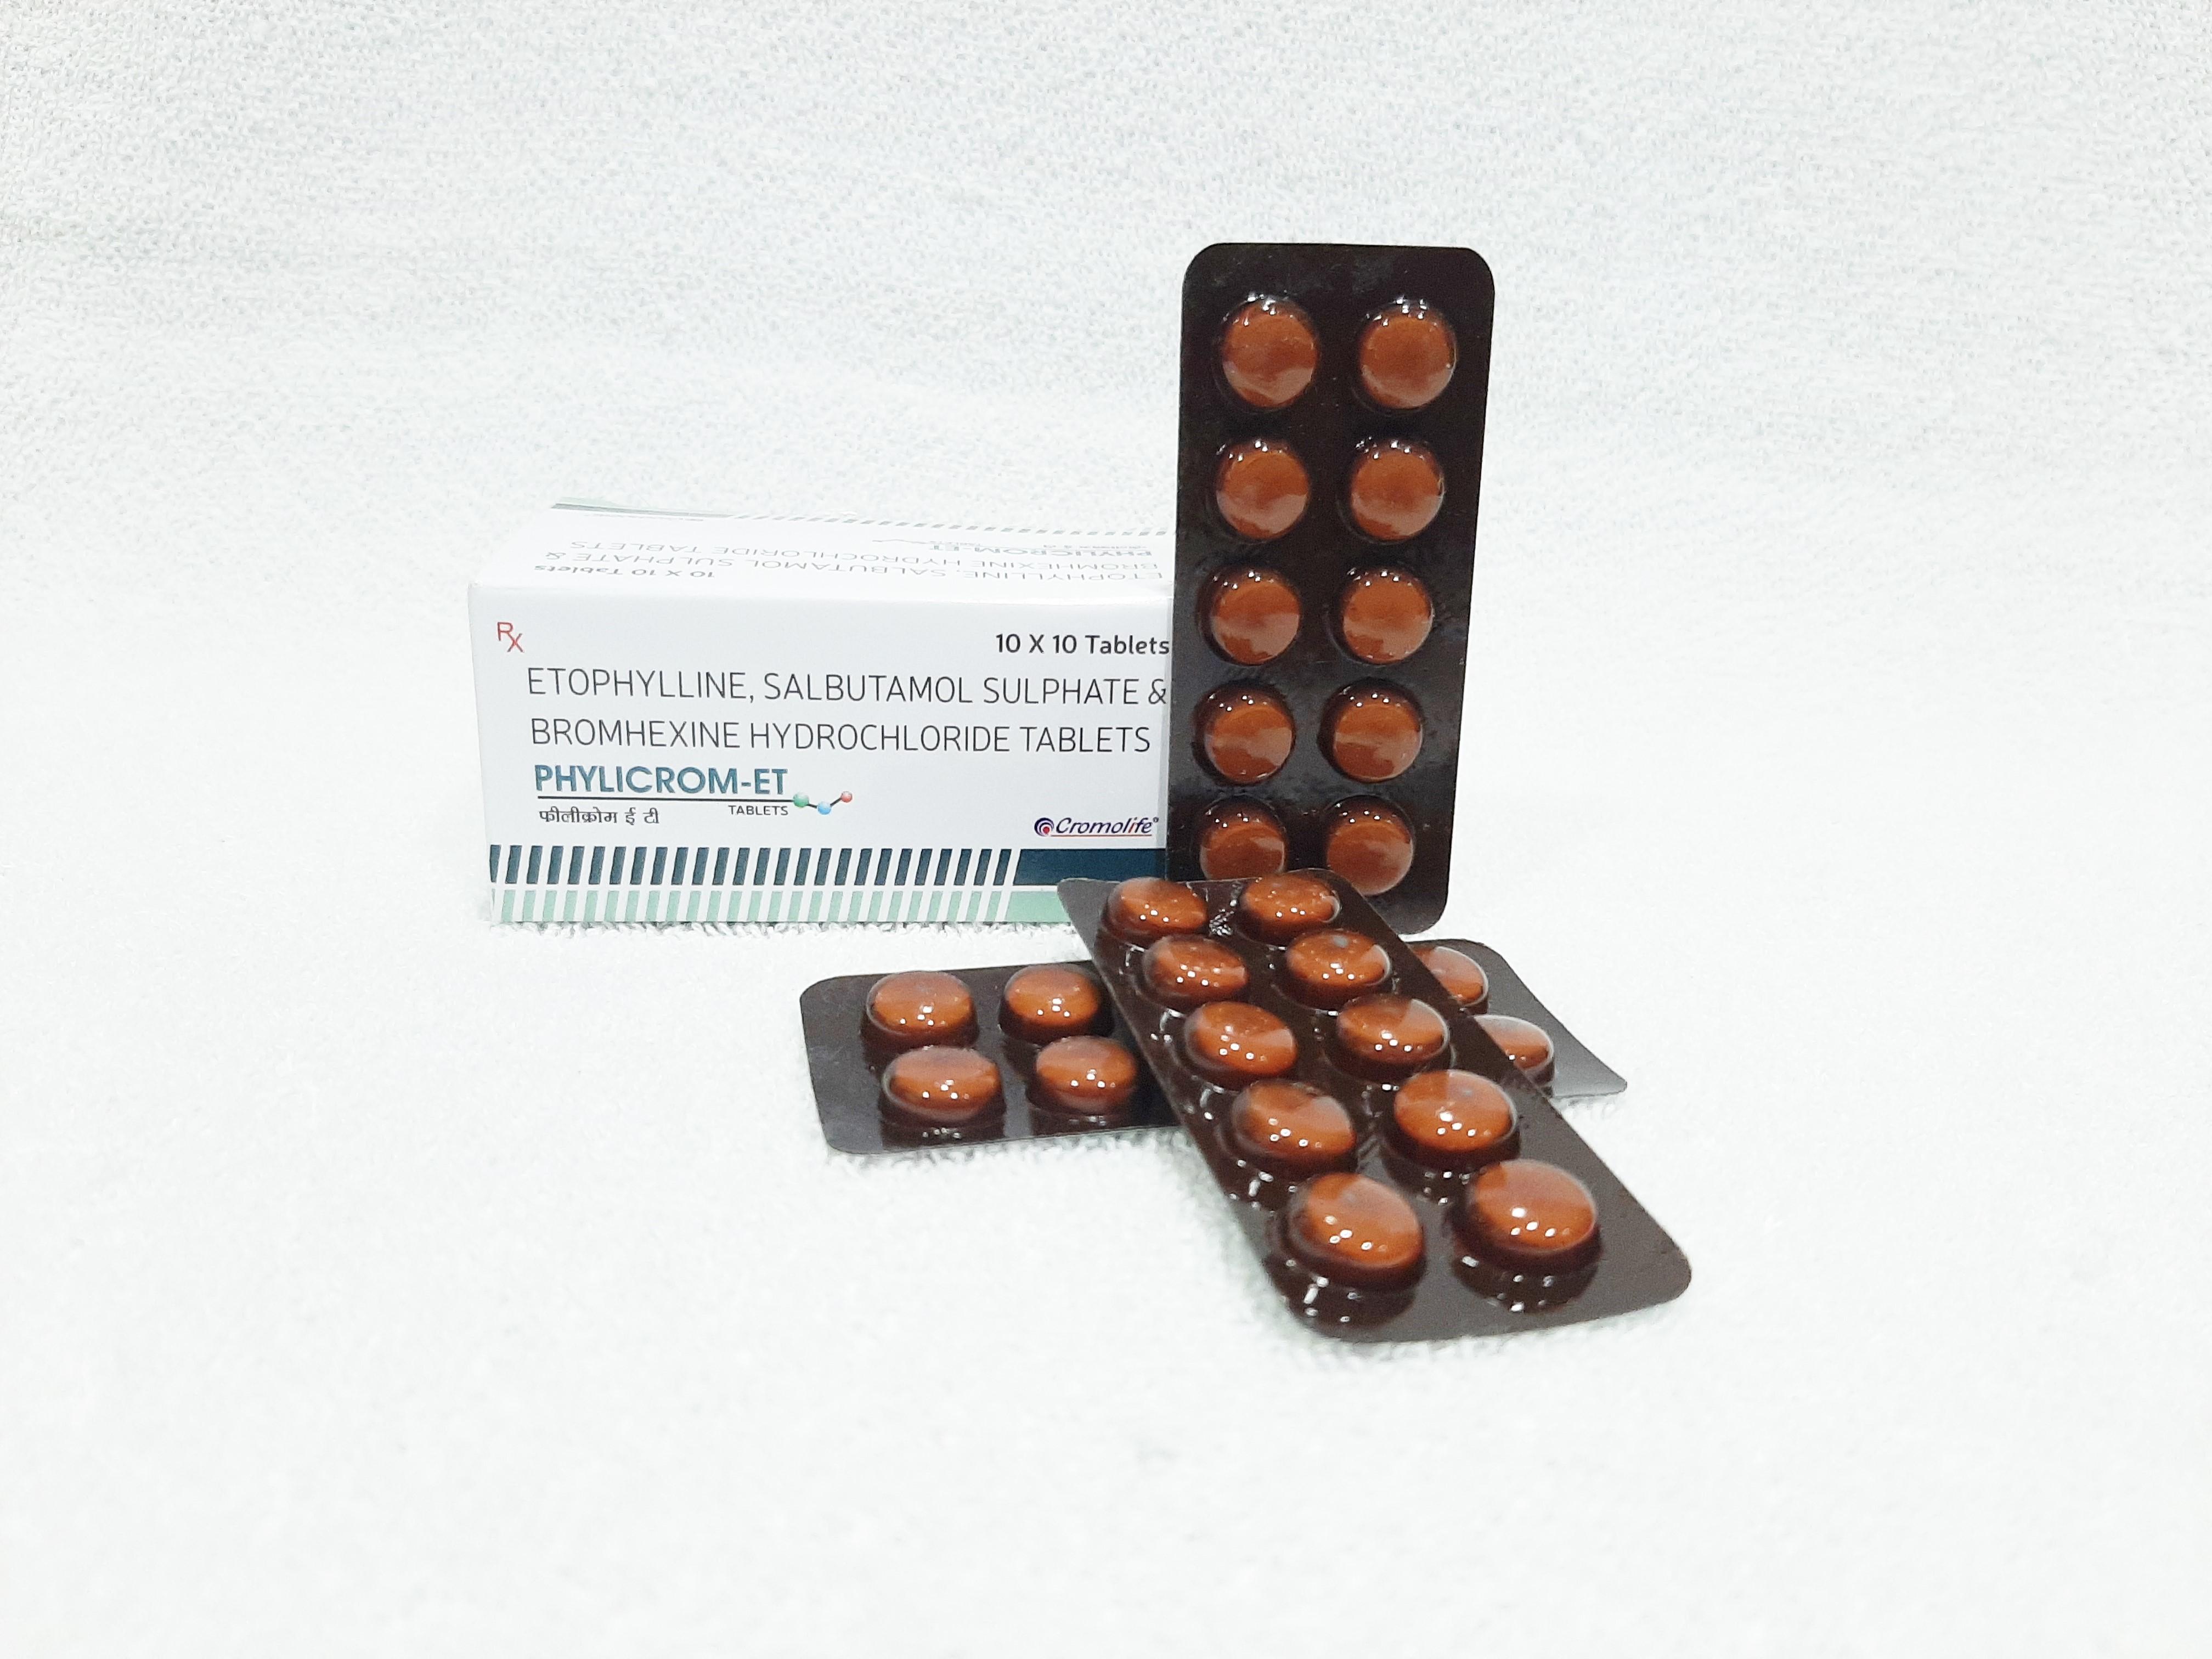 Etofylline, Terbutaline & Bromhexine Hydrochloride Tablet